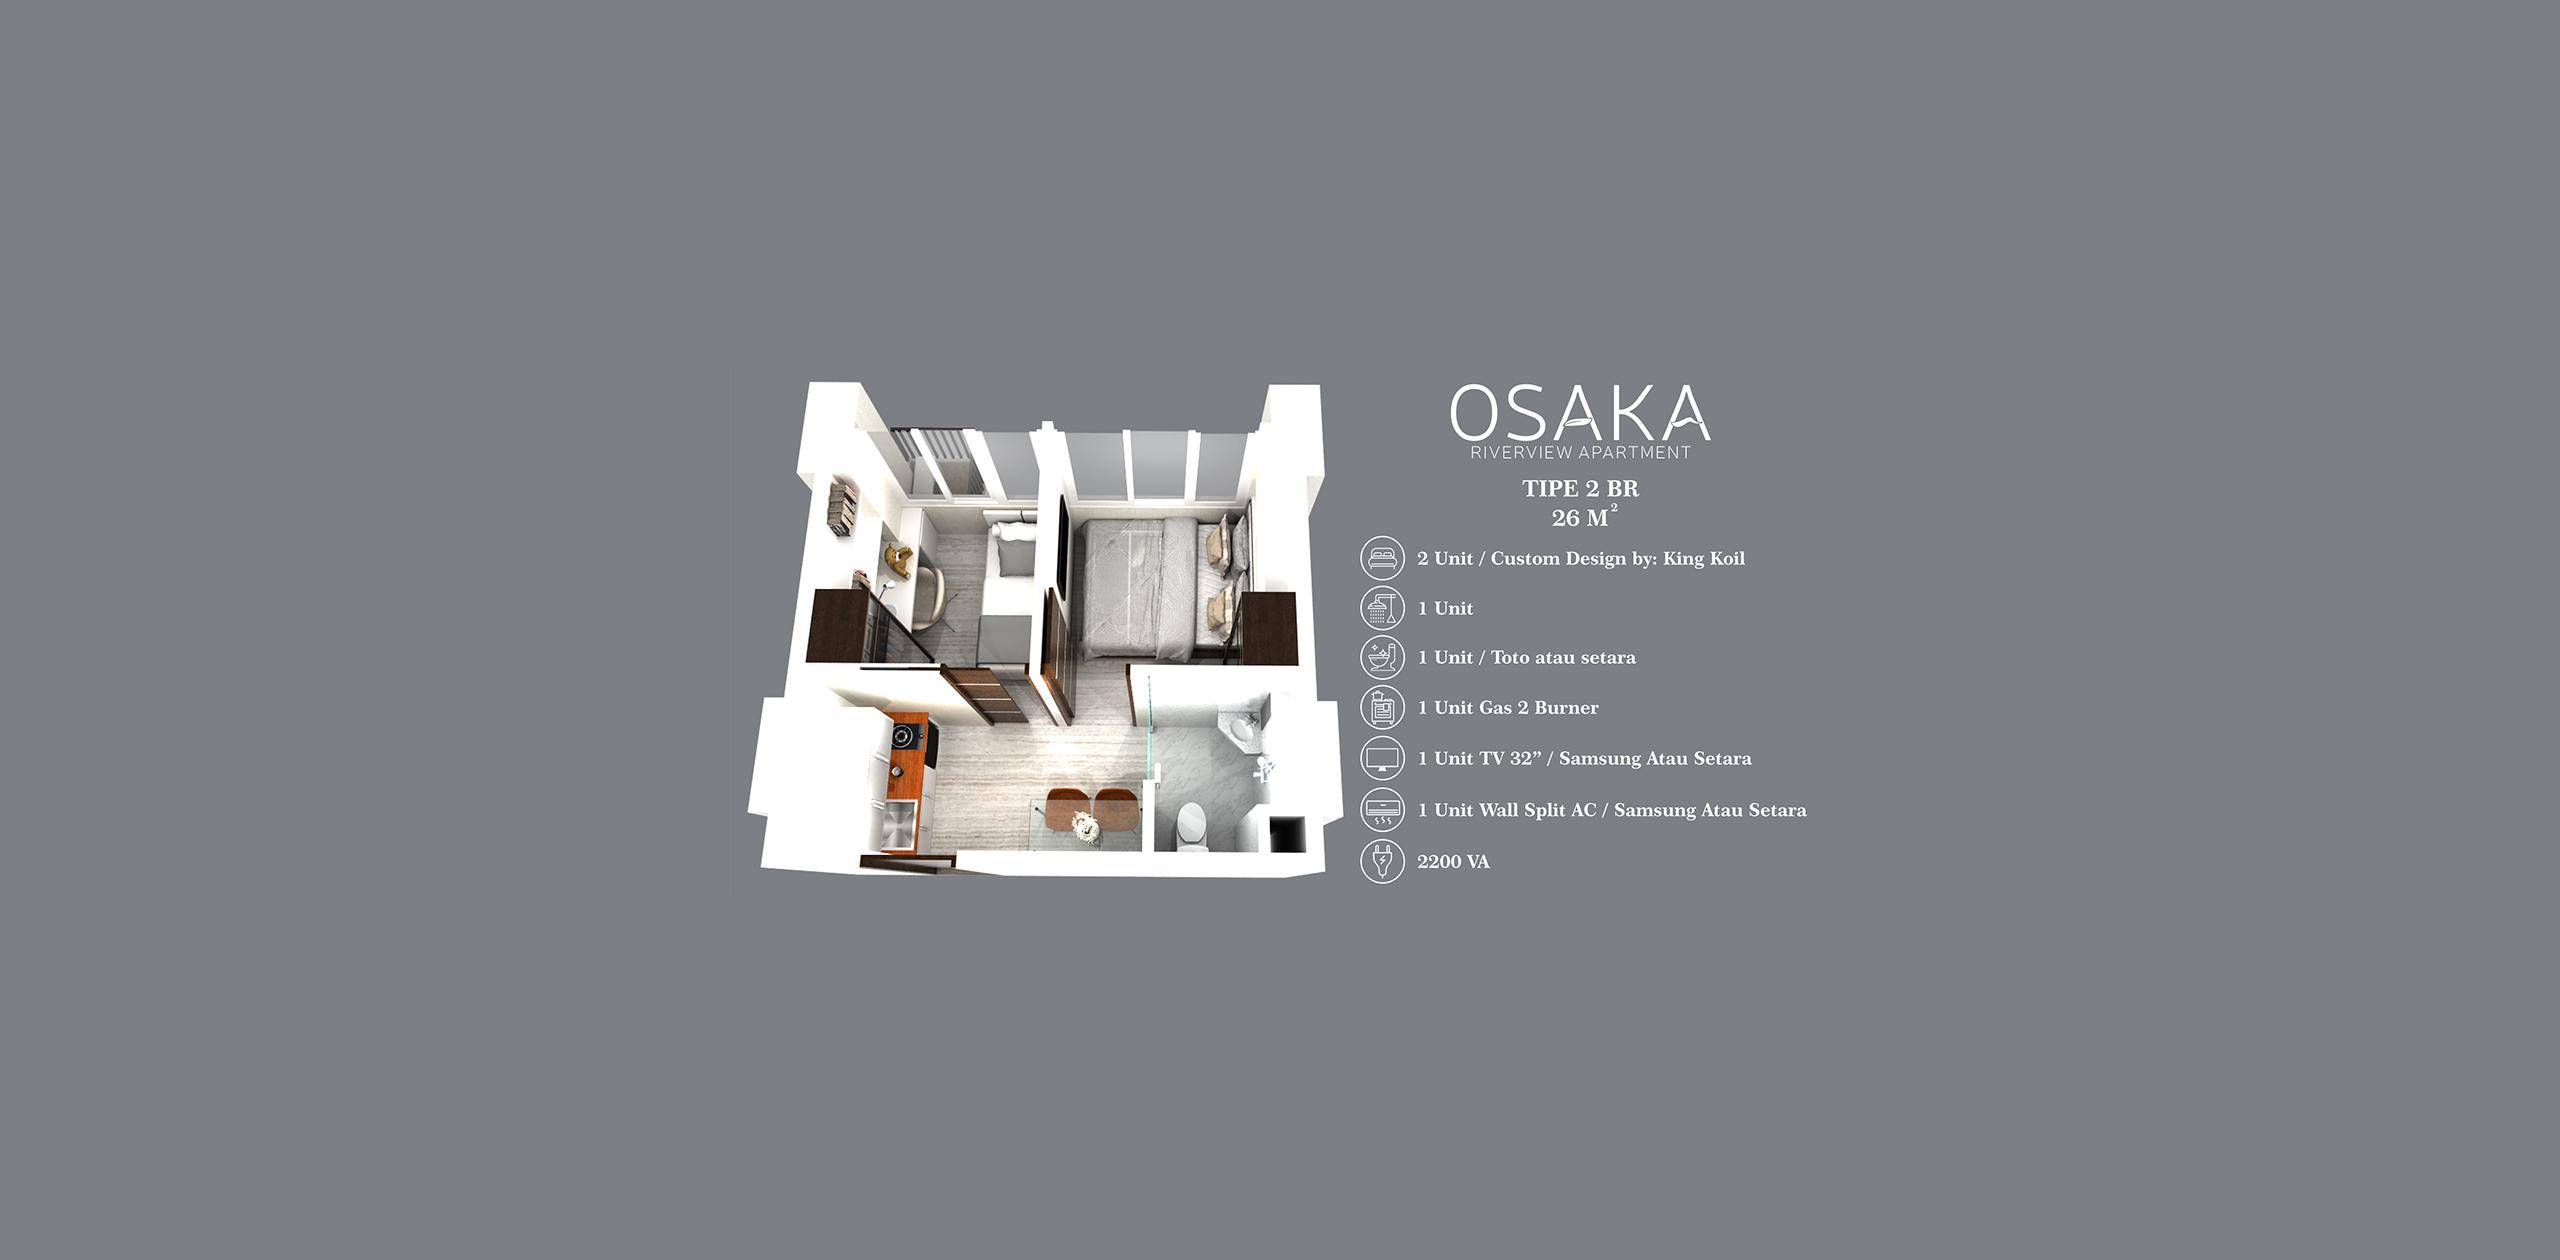 Pik2 - Osaka Riverview - 2BR